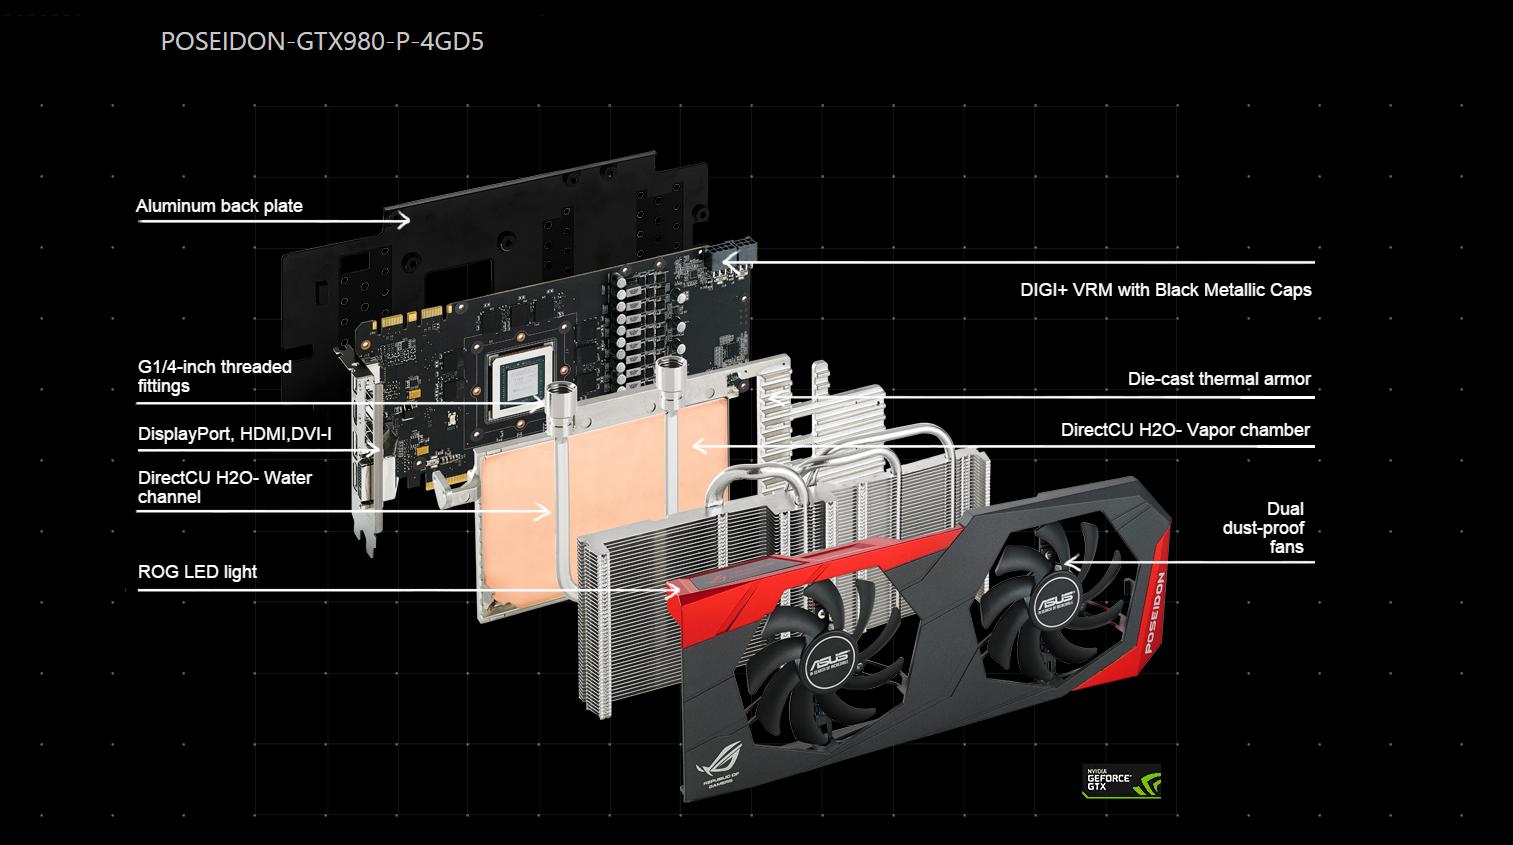 GeForce GTX 980 Poseidon